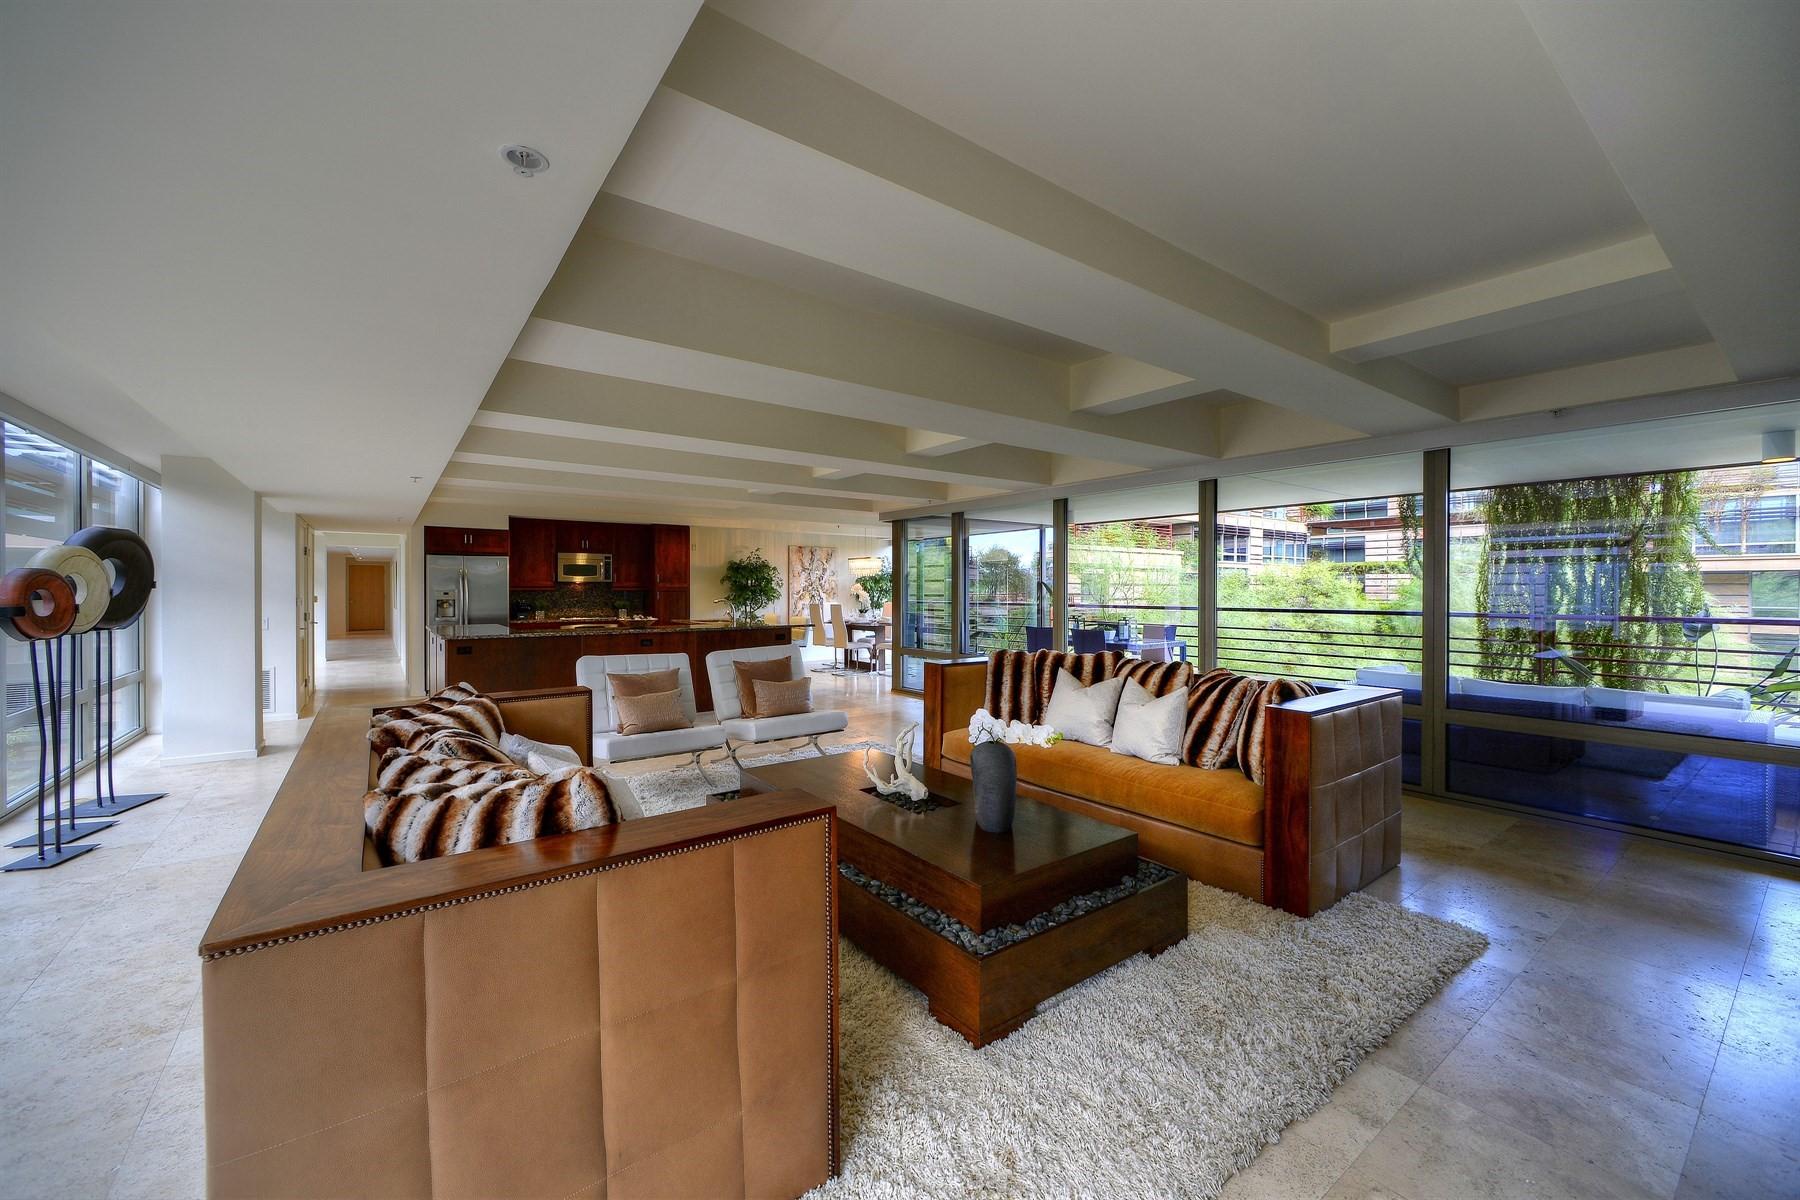 Apartment for Sale at Top Floor Bridge Condo at Optima Camelview Village 7167 E Rancho Vista Dr #4014 Scottsdale, Arizona 85251 United States